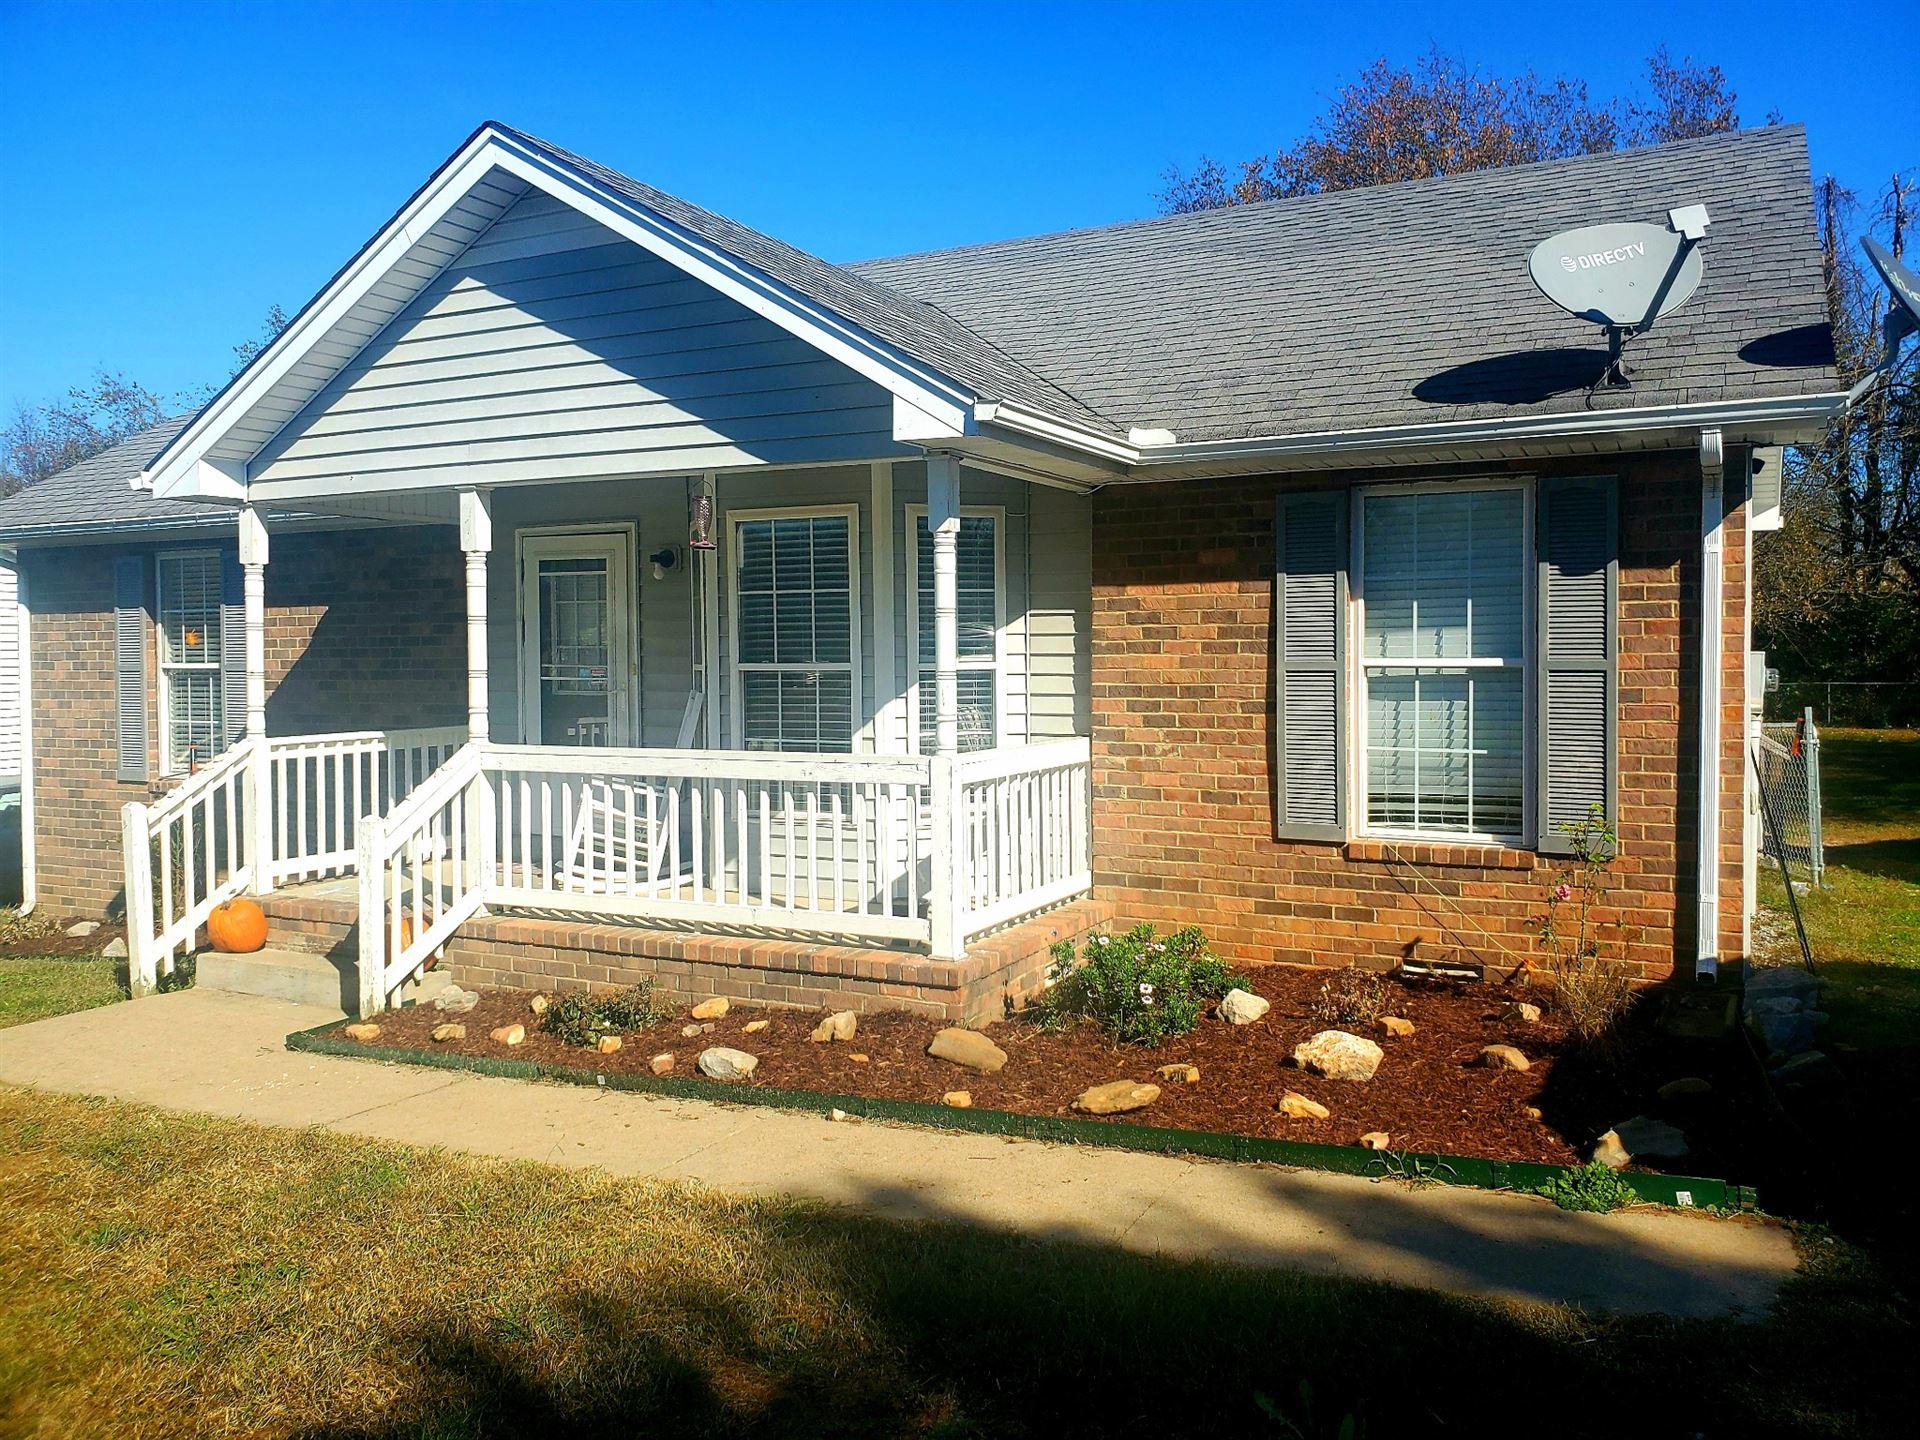 2600 Queen Anne Ct, Springfield, TN 37172 - MLS#: 2204623